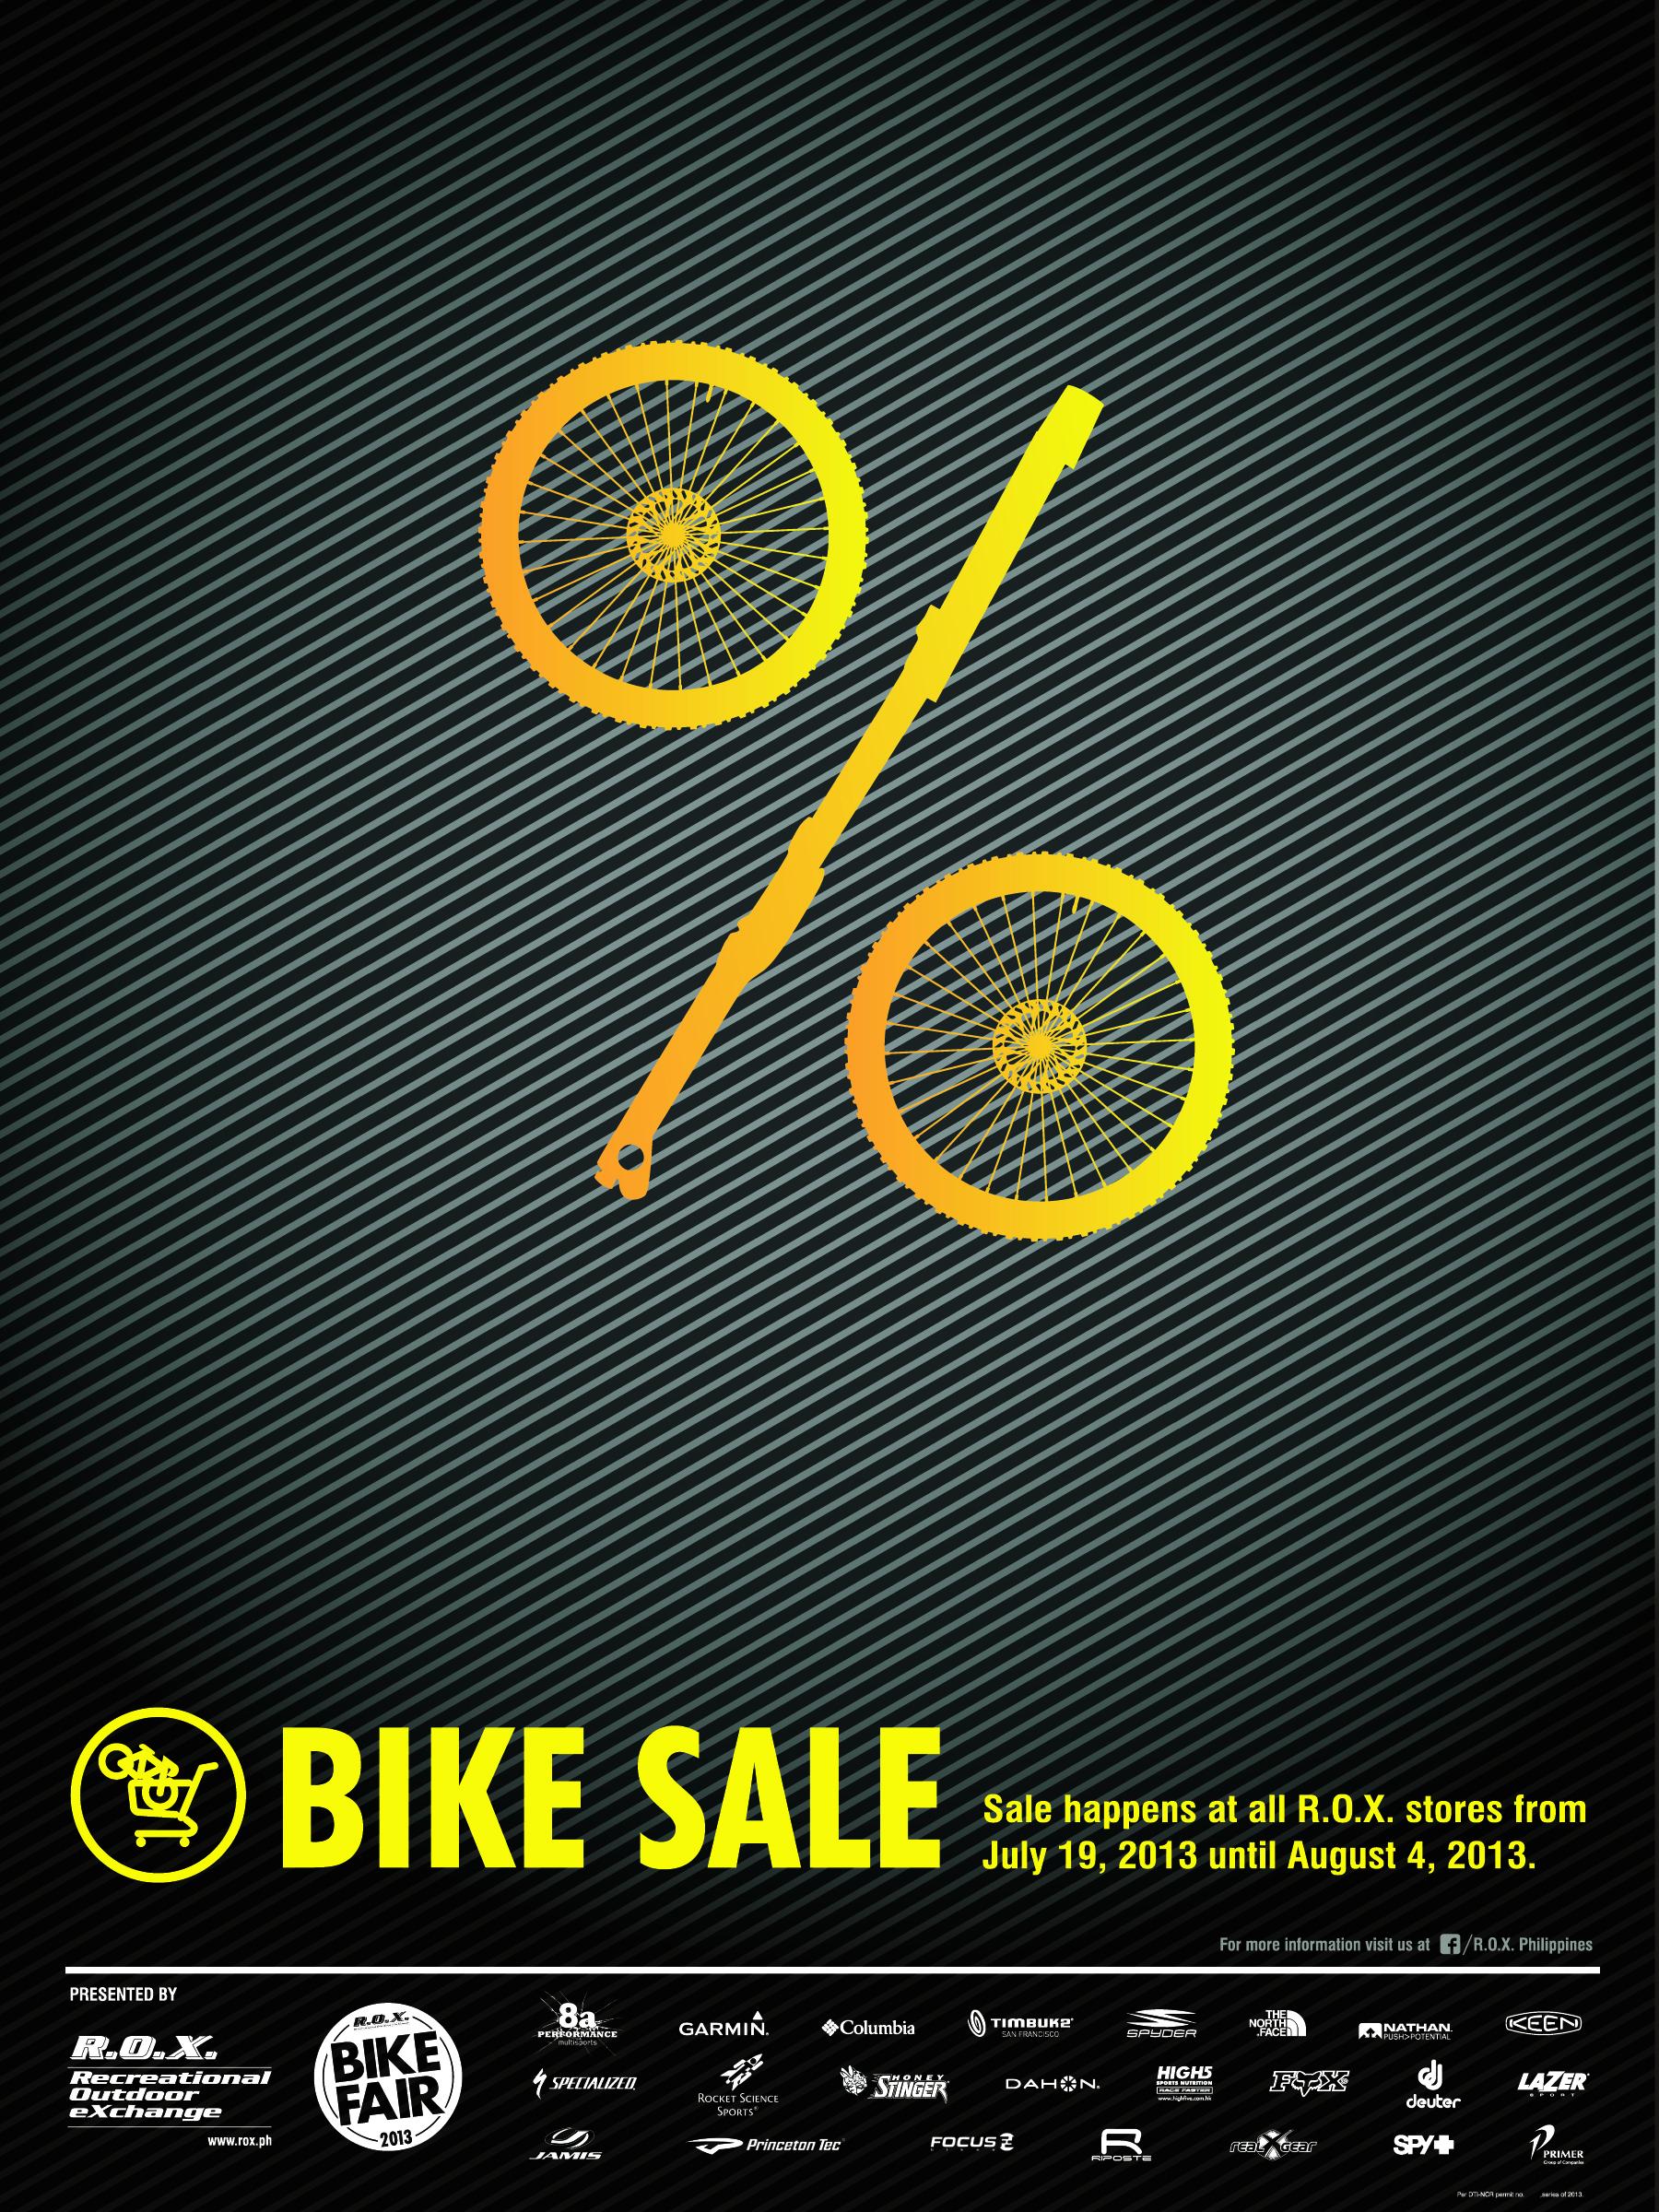 R,O.X. Bike Sale July - August 2013